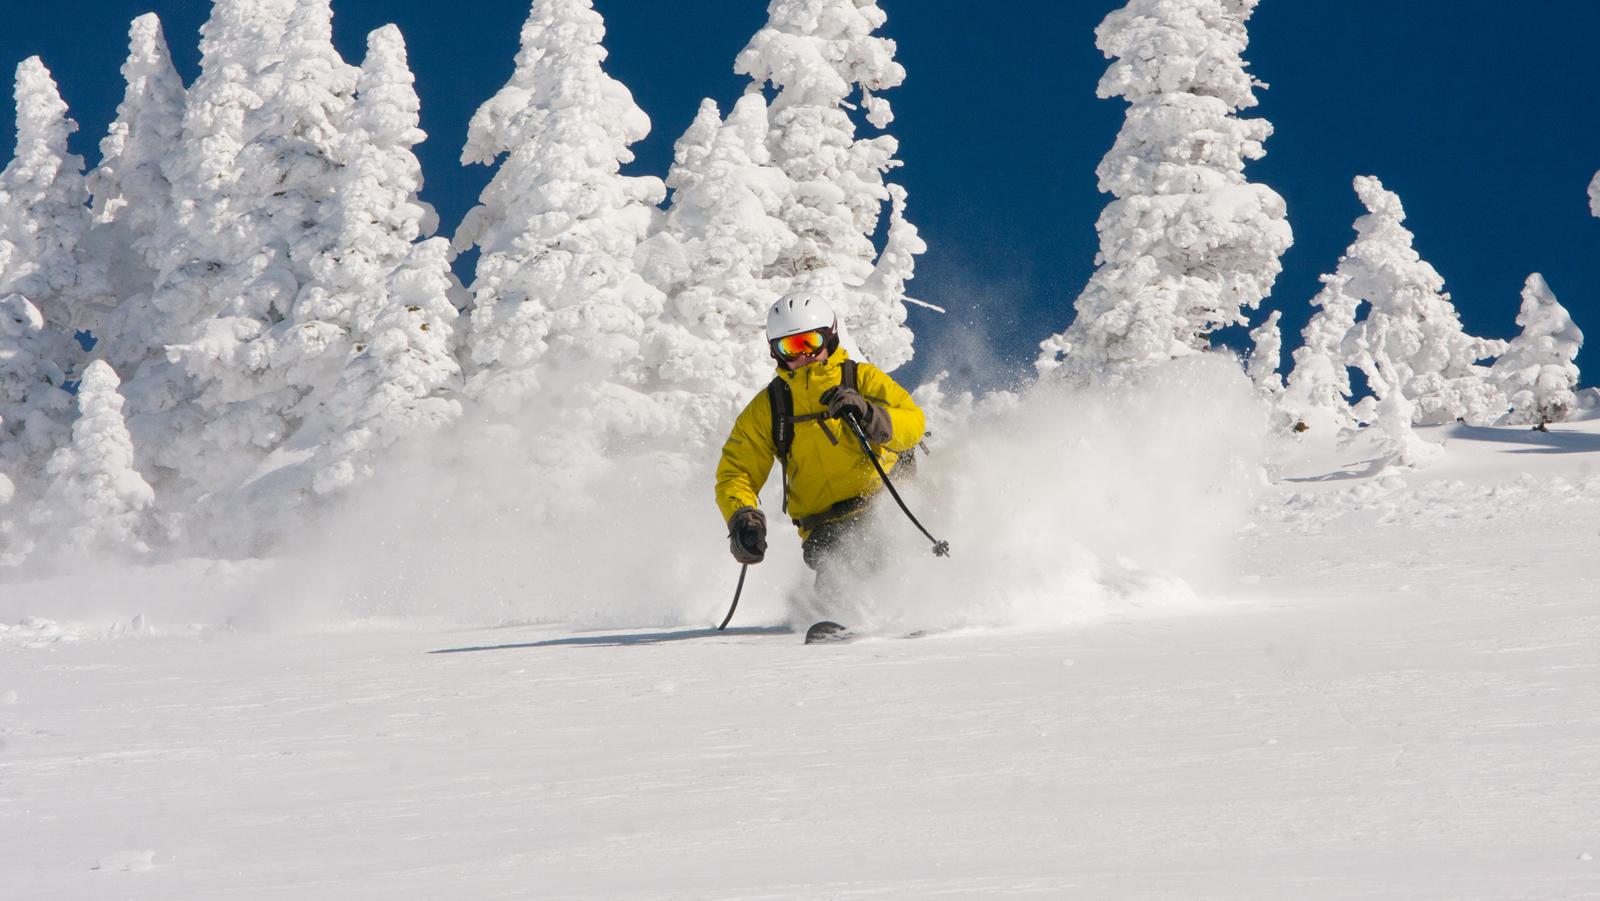 Backcountry Snowboarding Wallpaper Wallpapersafari